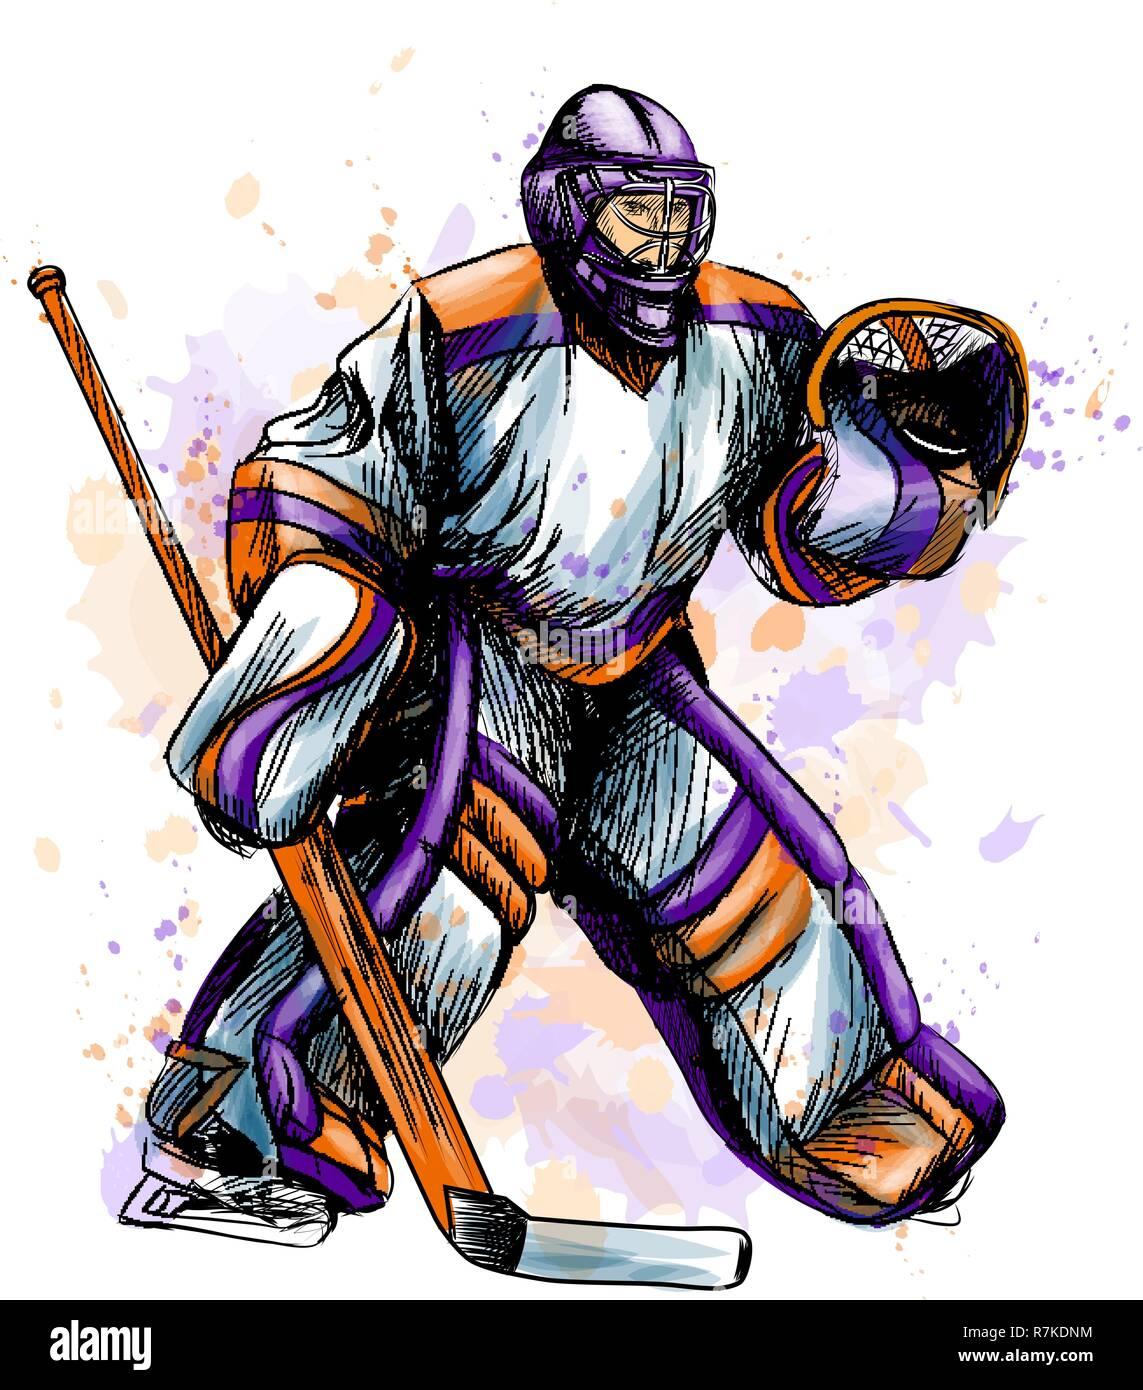 Hockey Goalie Mask Icon Cartoon Stock Photos Hockey Goalie Mask